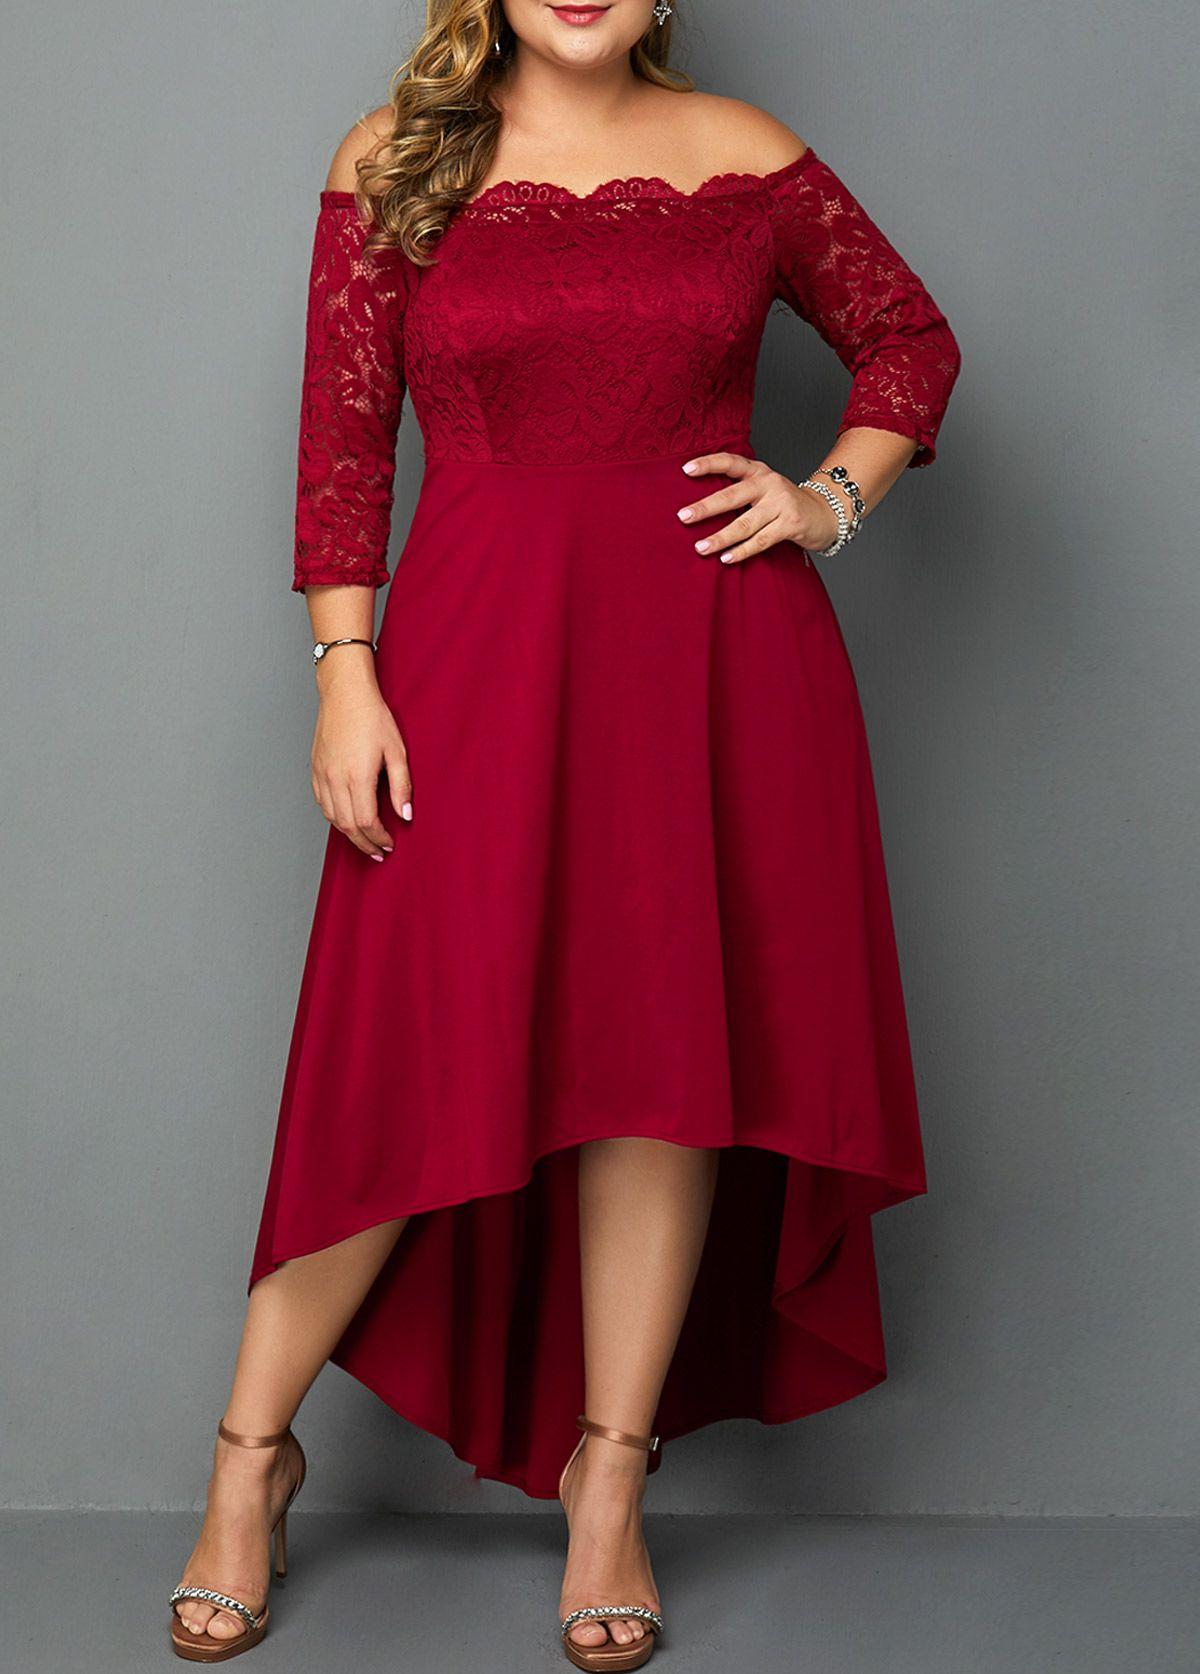 Plus Size Lace Panel Off The Shoulder High Low Dress Rotita Com Usd 33 43 Plus Size Fall Fashion Plus Size Cocktail Dresses Plus Size Formal Dresses [ 1674 x 1200 Pixel ]